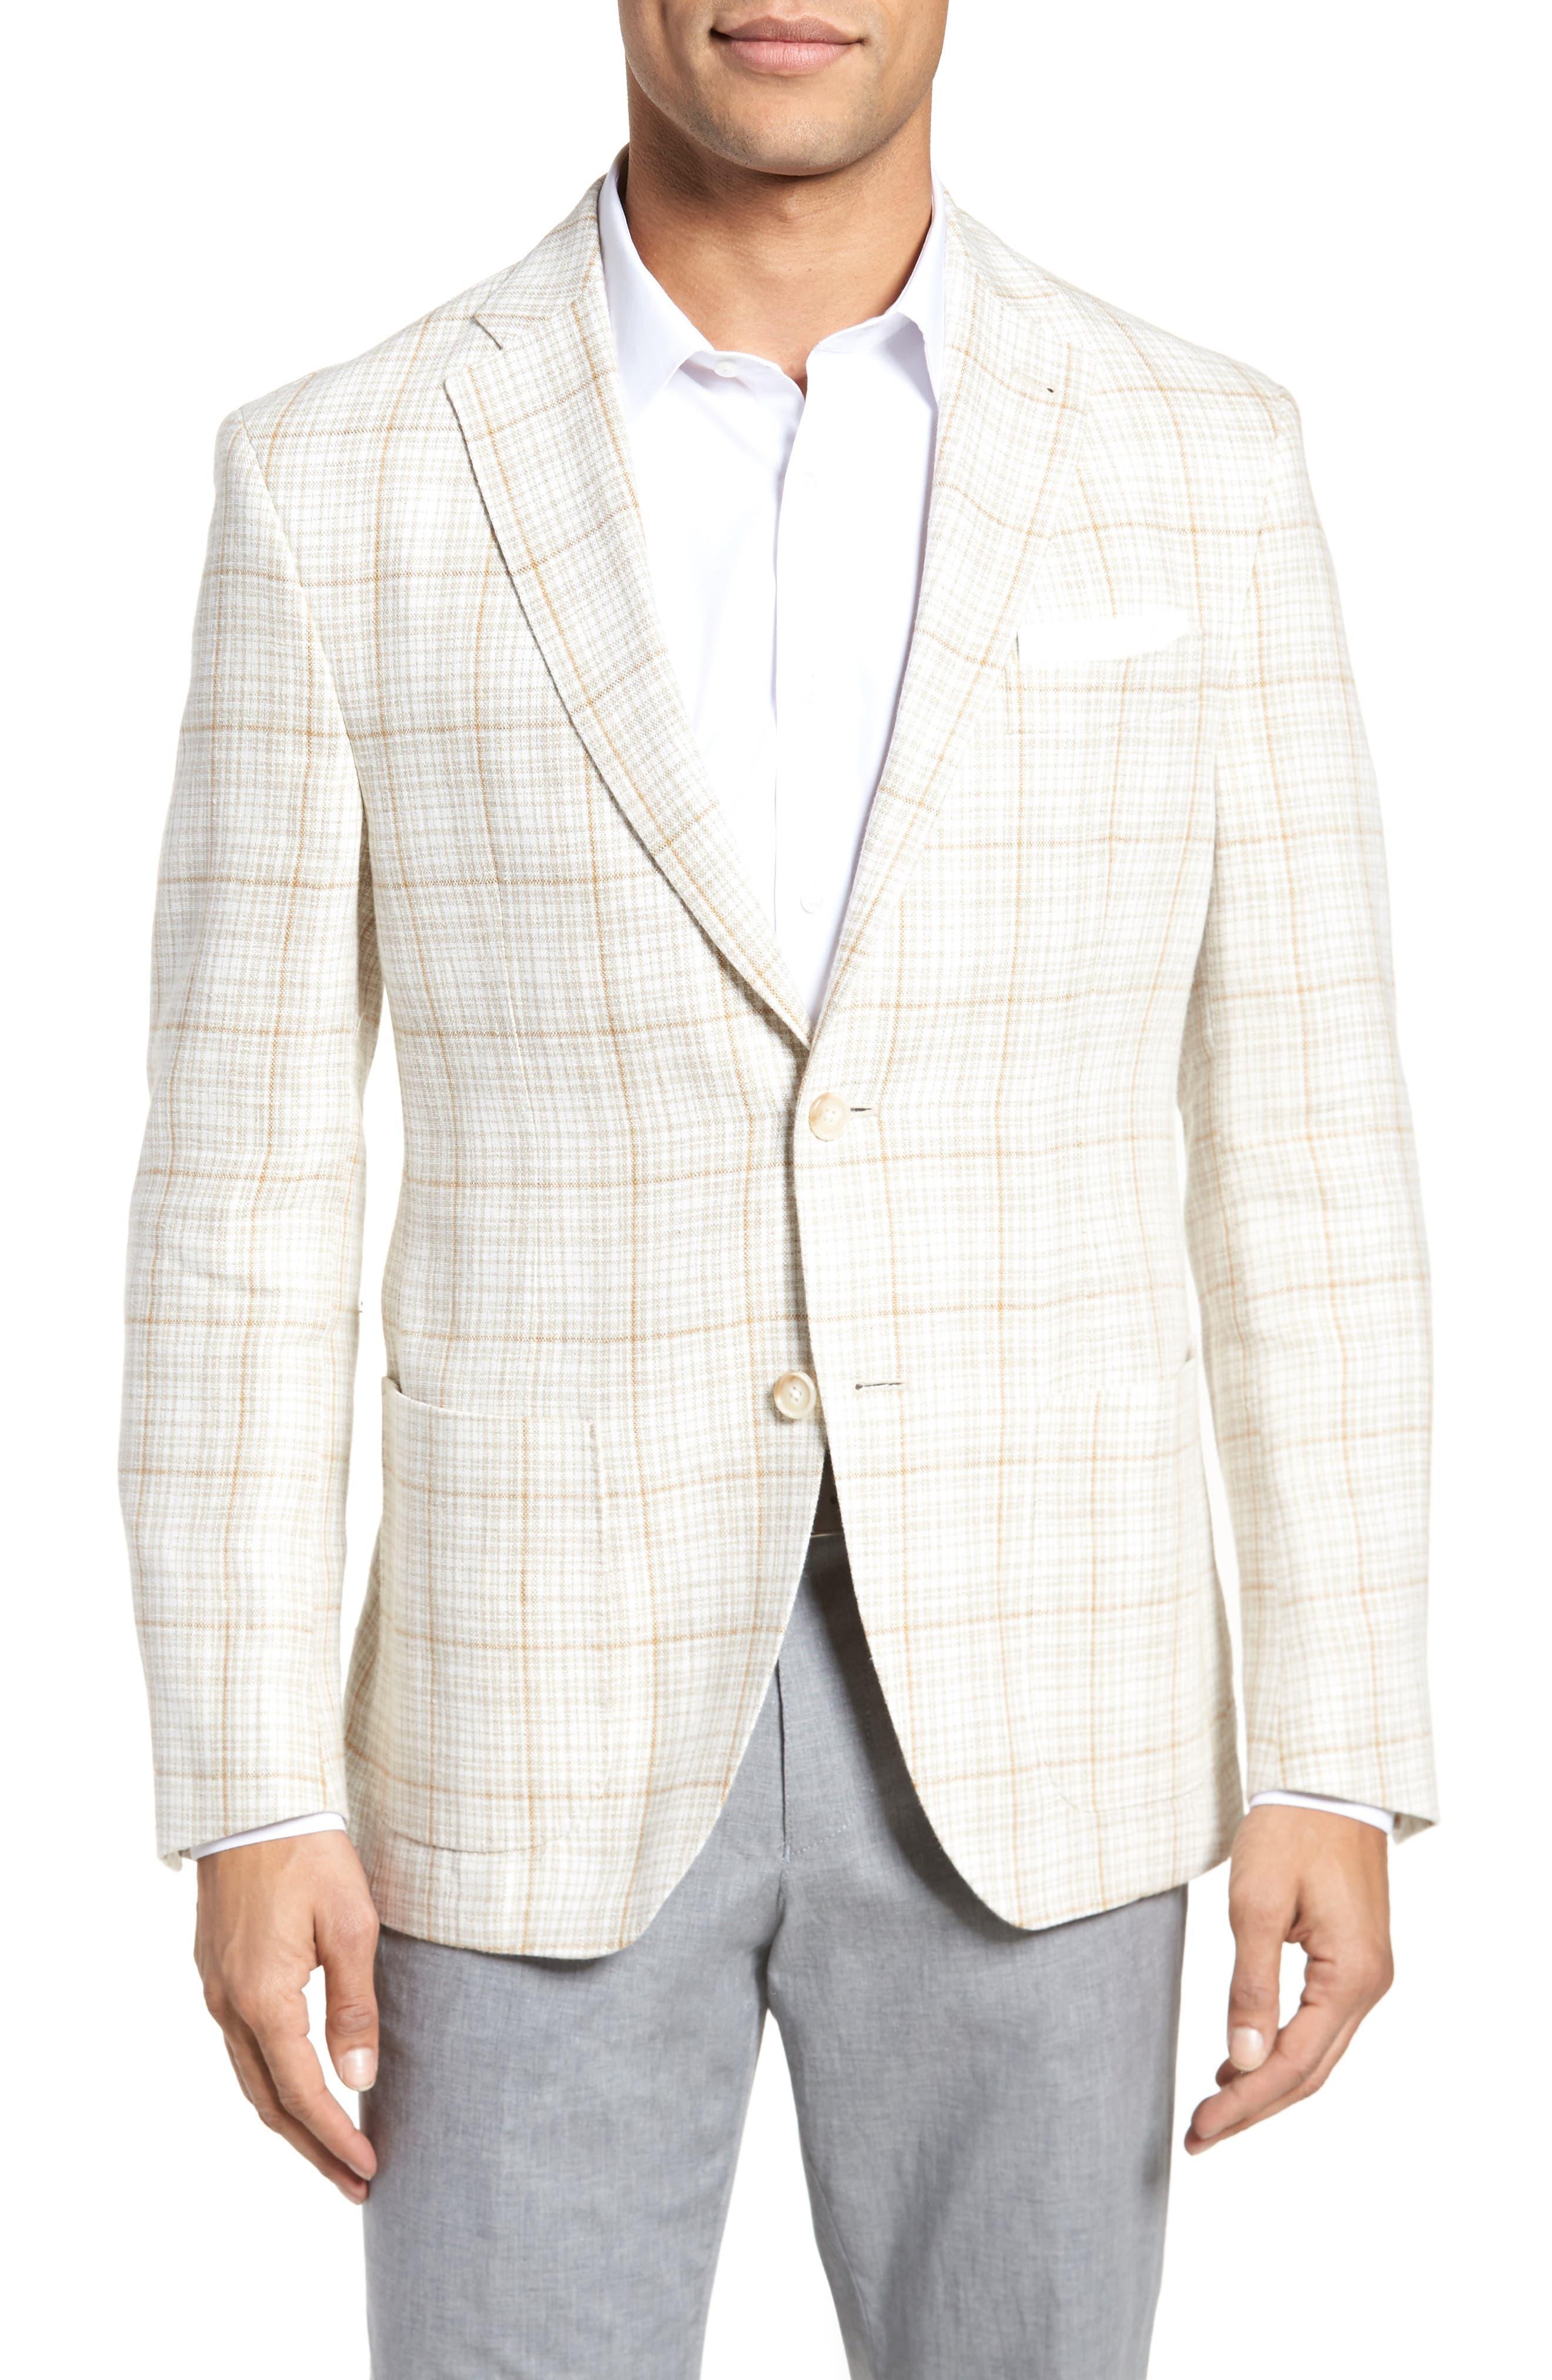 Main Image - JKT New York Trent Trim Fit Plaid Linen Sport Coat